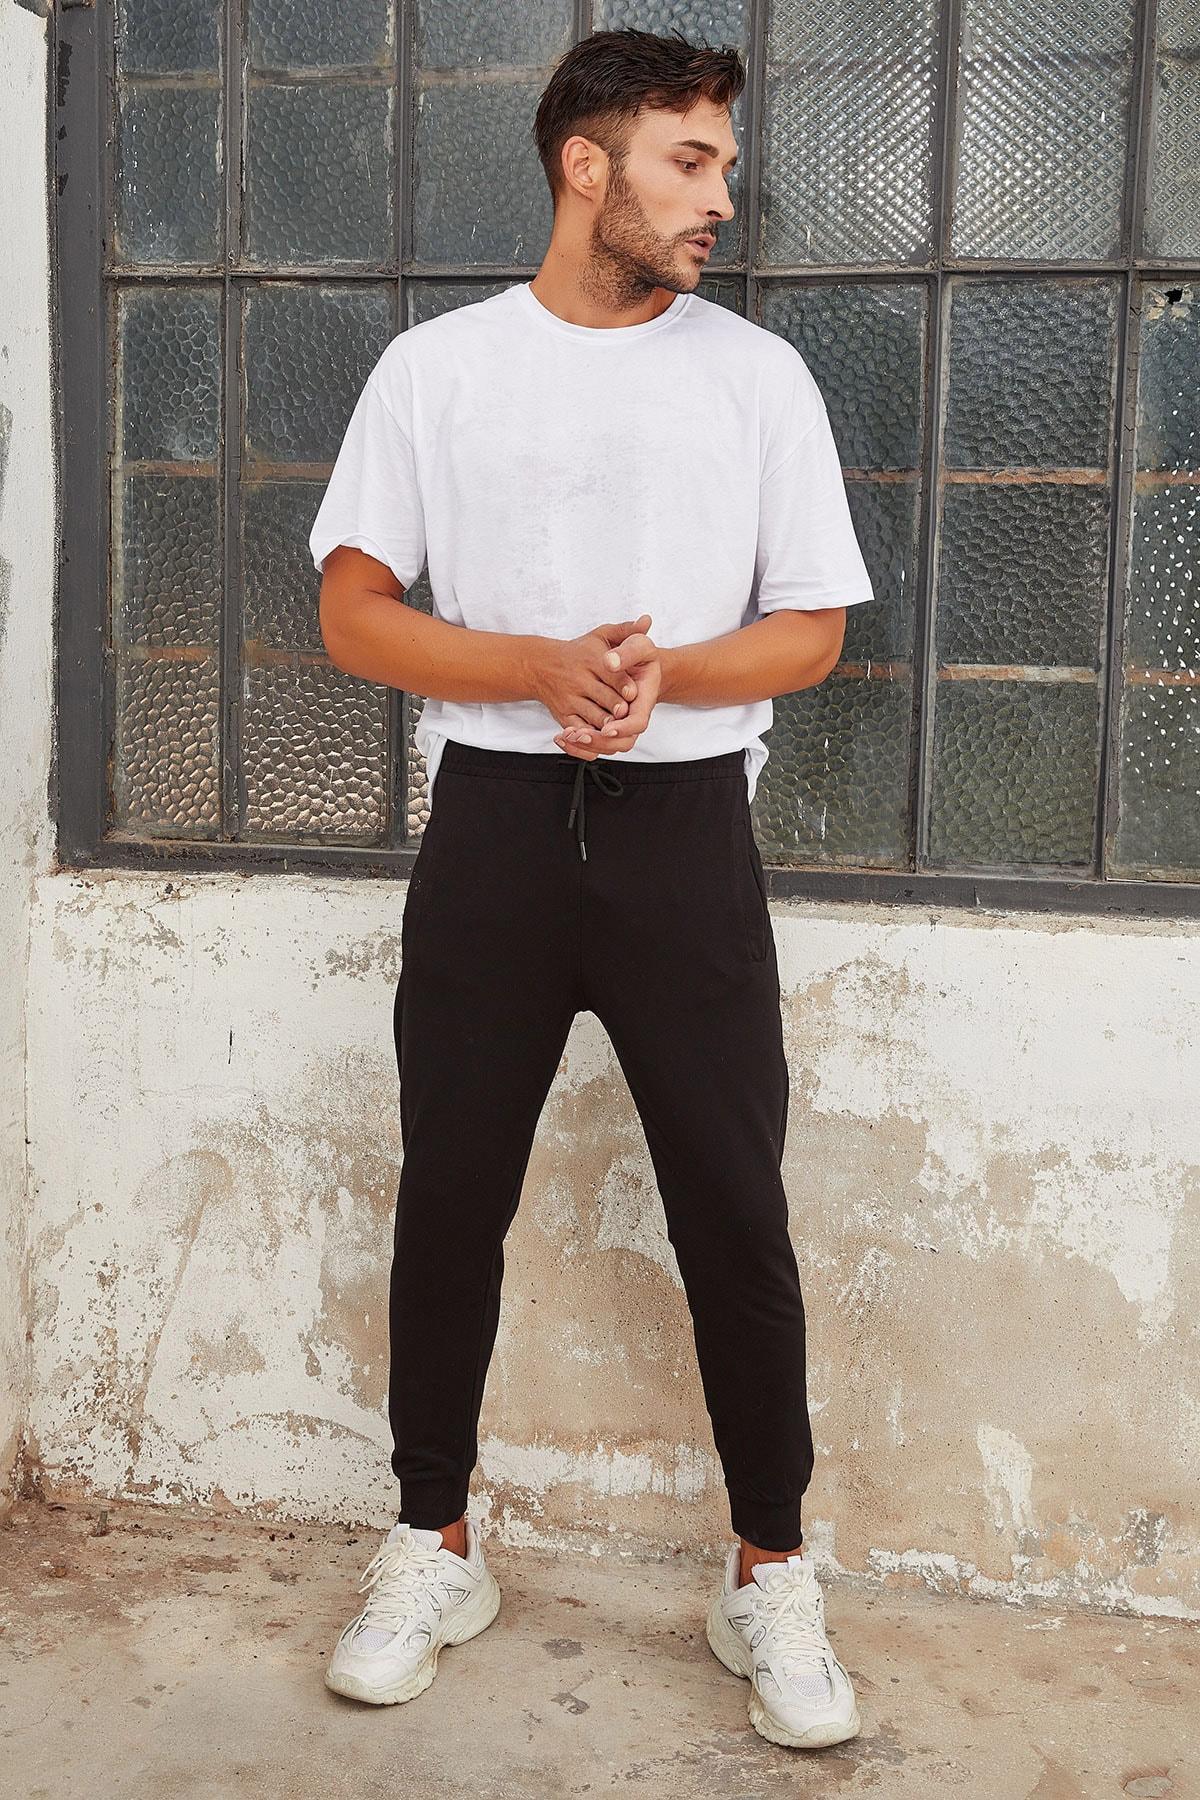 OnlyCool Erkek Siyah Dar Paça Jogger Eşofman Altı 2